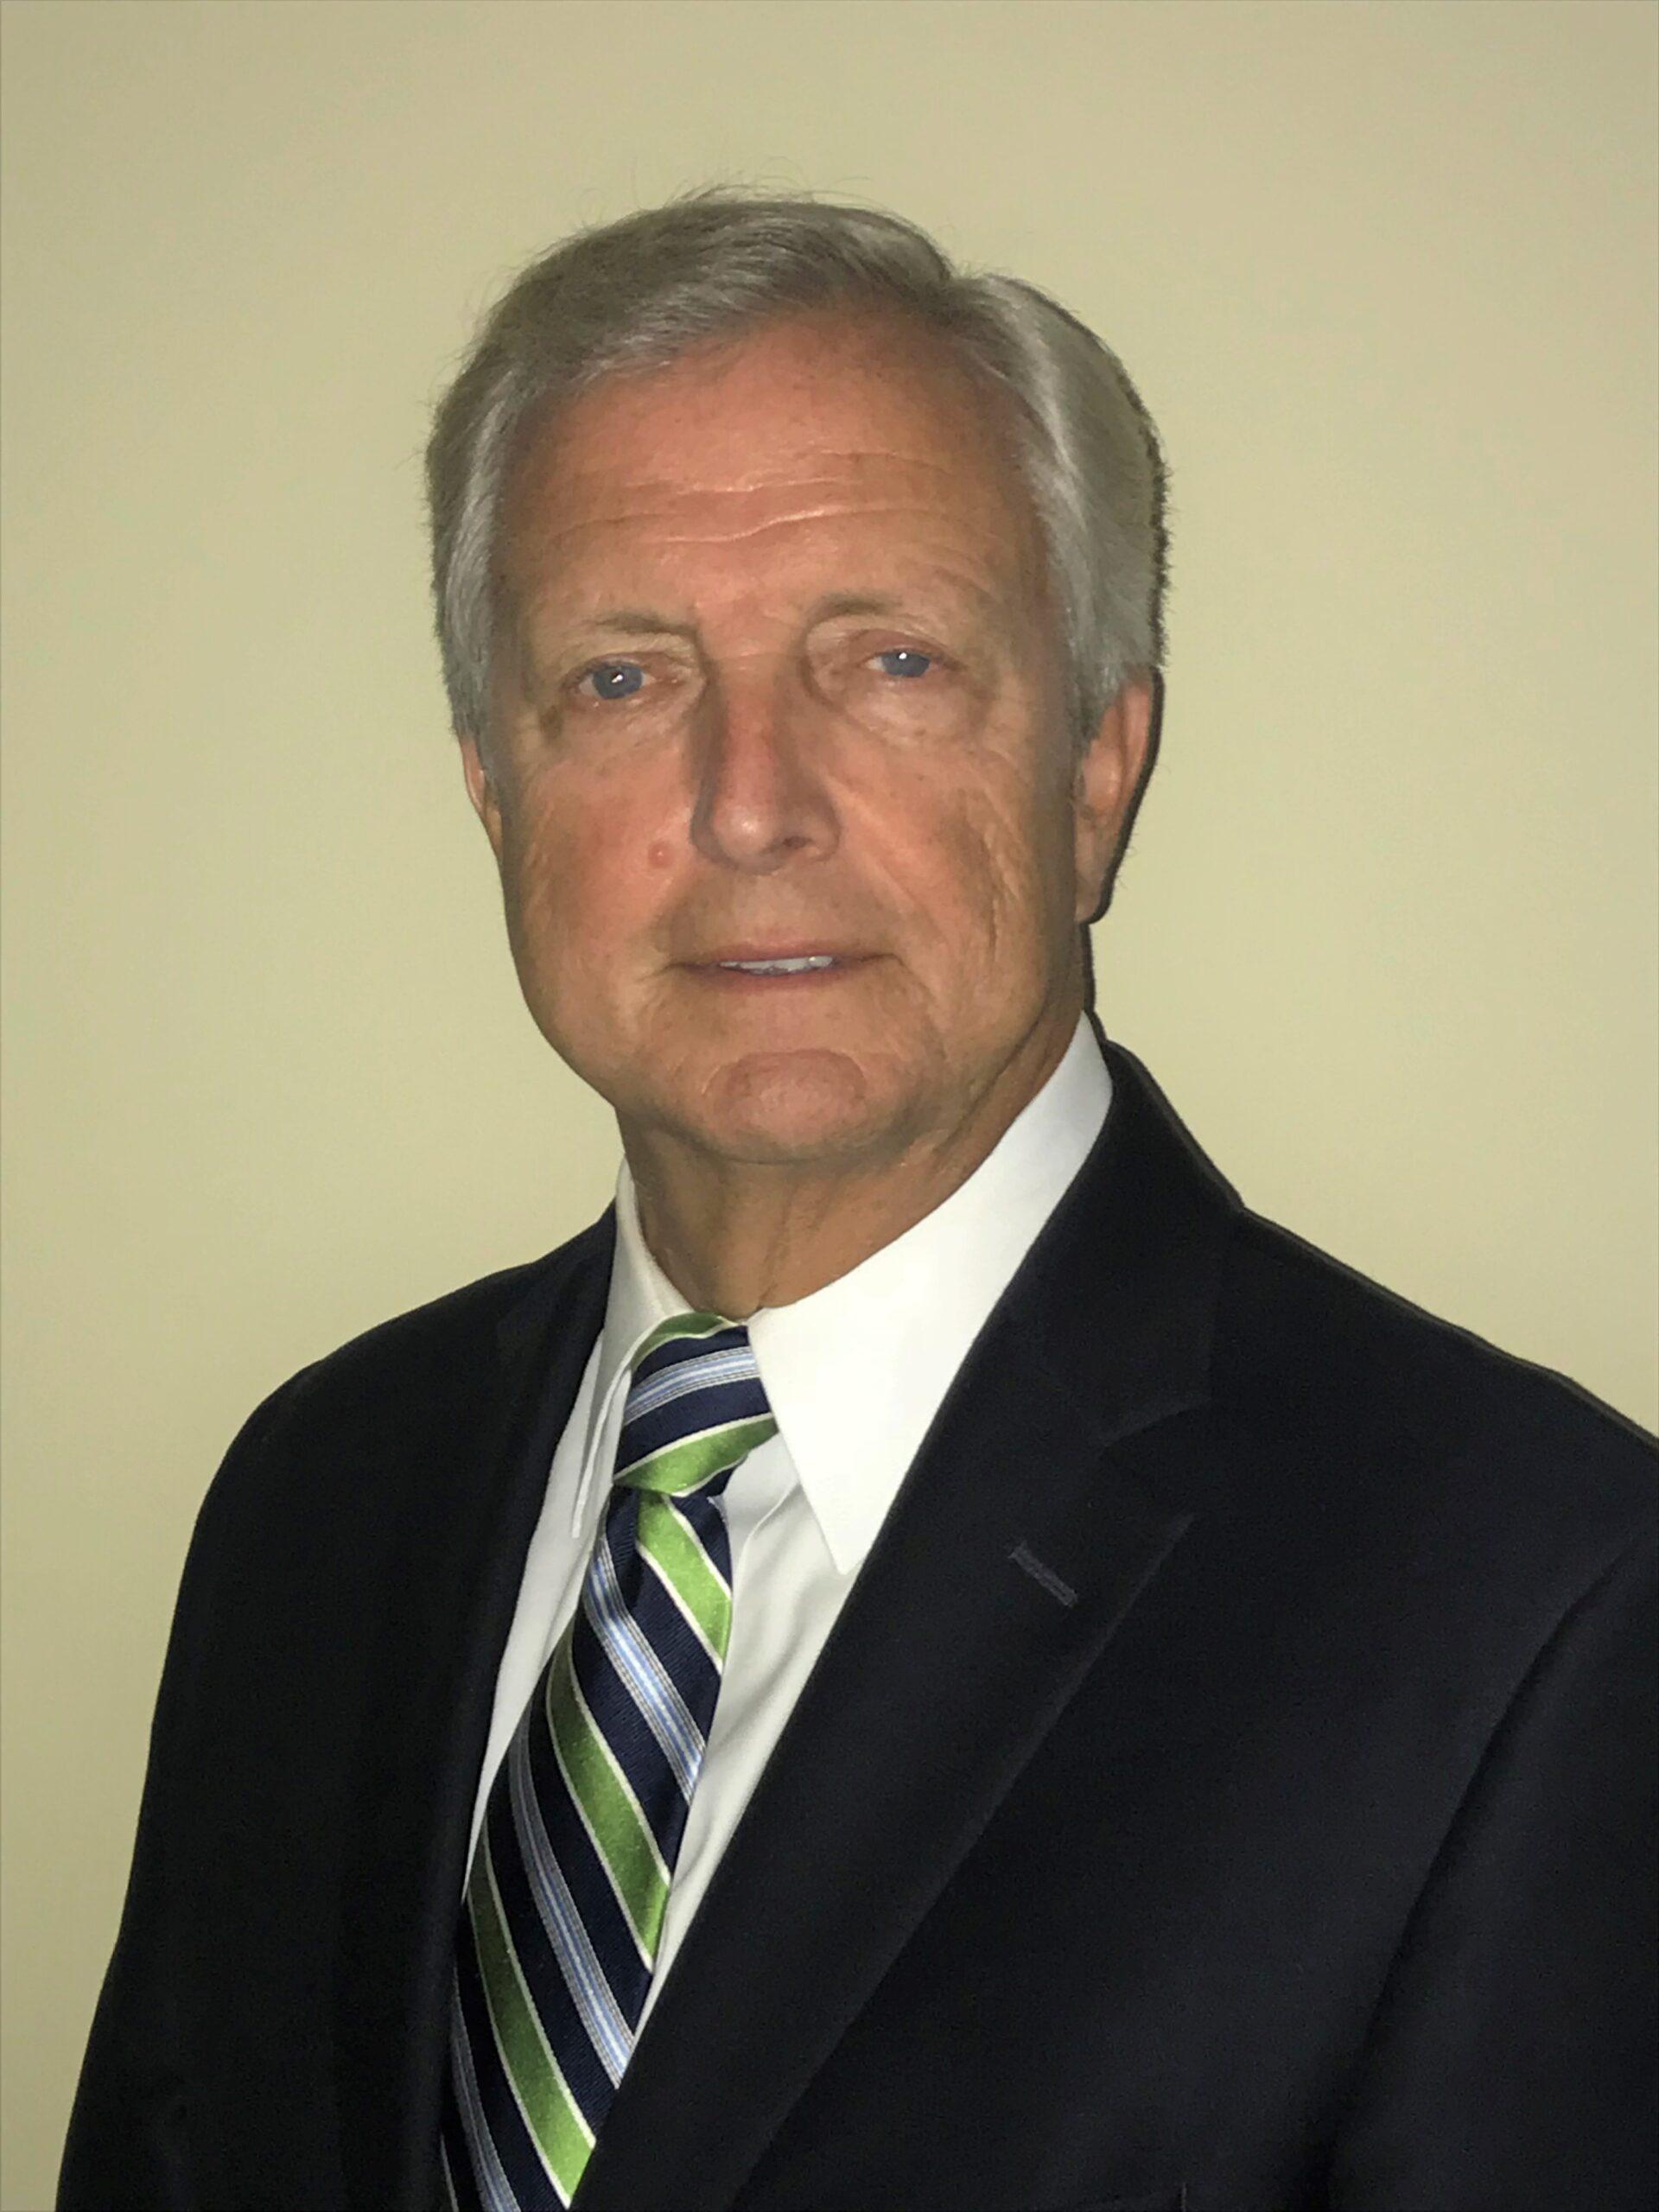 Robert W. Perkins